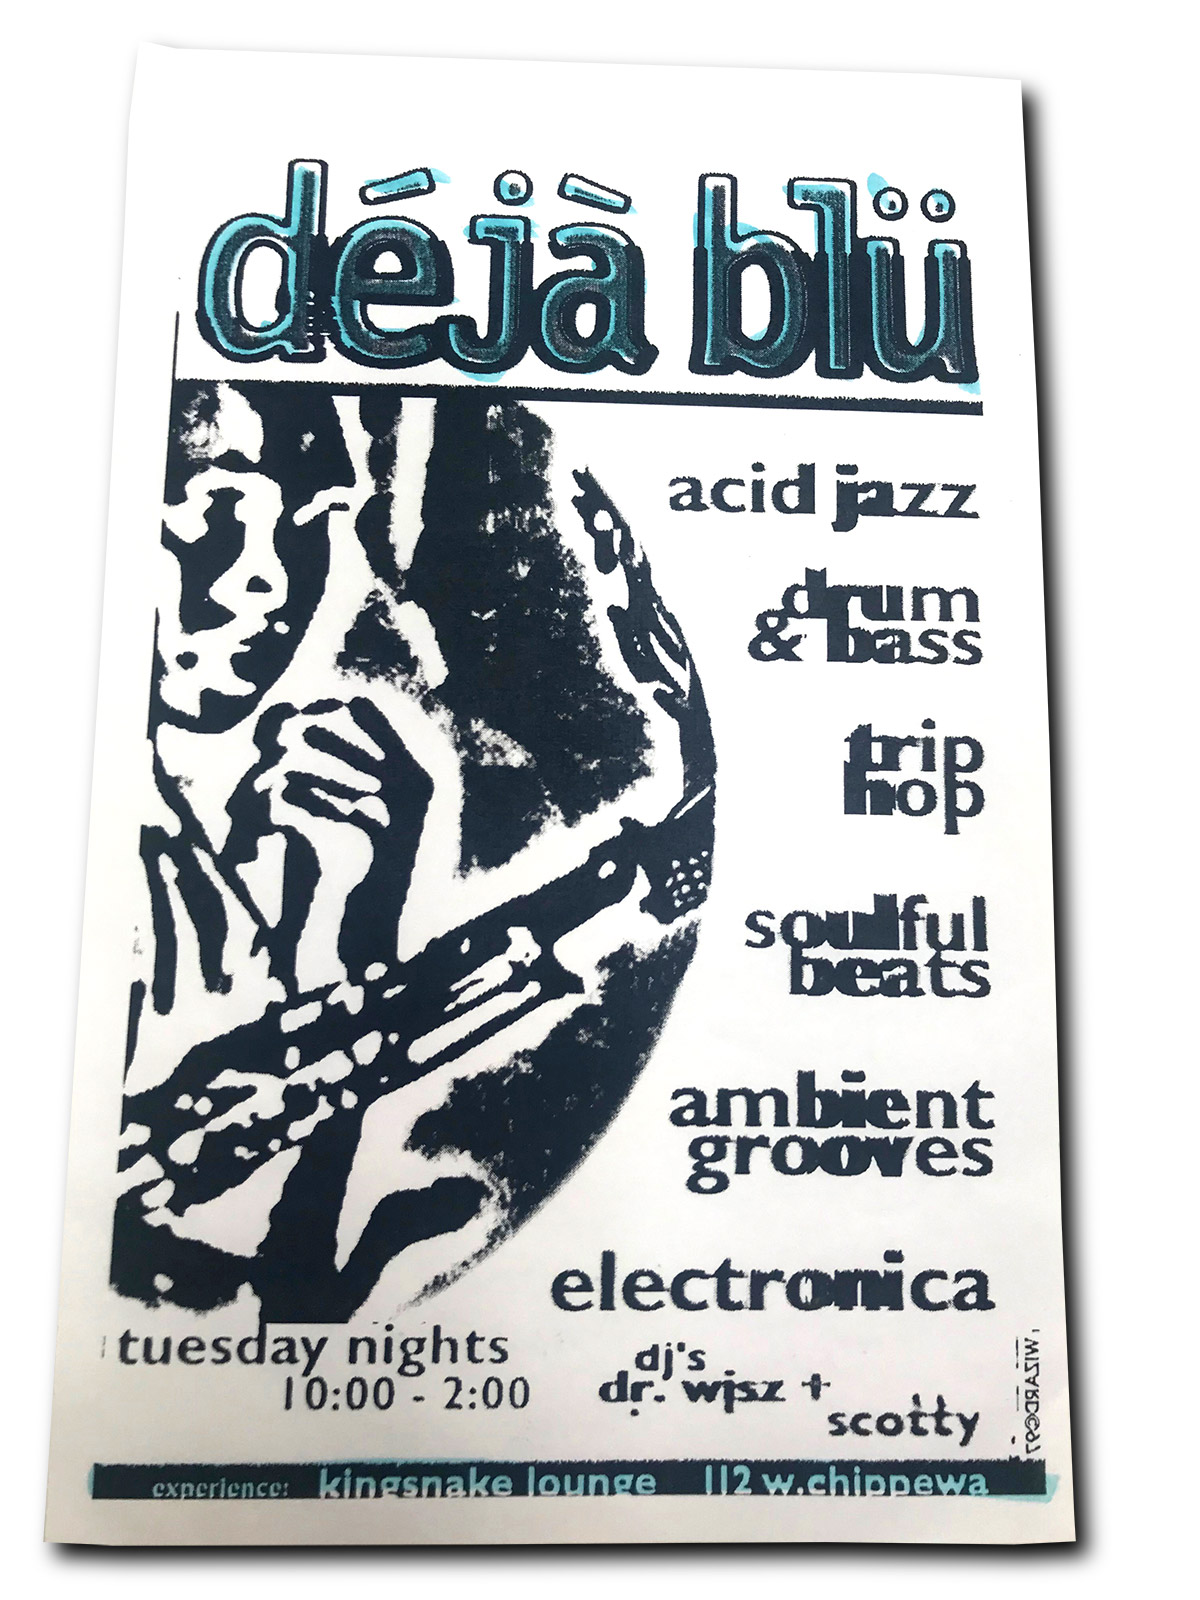 dejablu, deja blu, DJs, DJ Dr Wisz, DJ Scotty, Kingsnake Lounge, Buffalo NY, poster design, graphic design, mark wisz